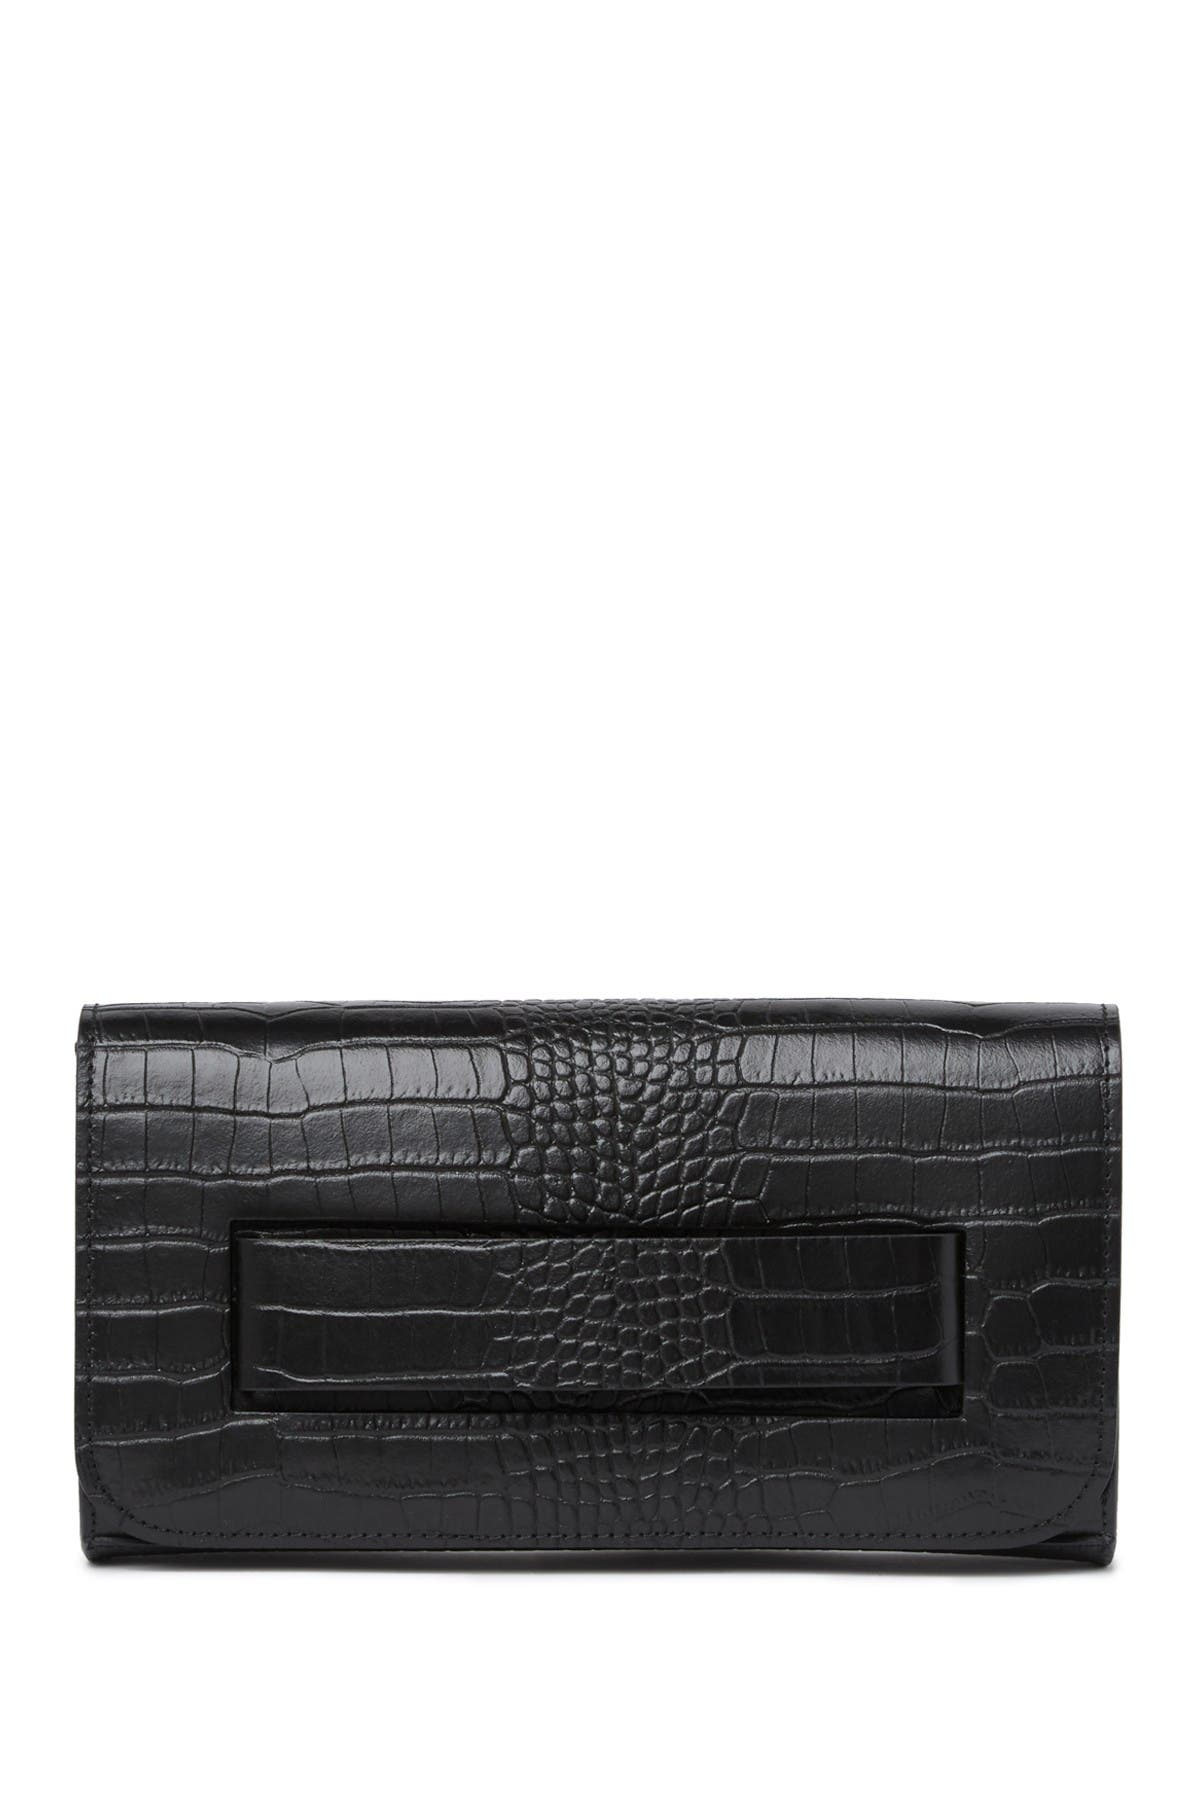 Image of Scui Studios Croc Embossed Leather Clutch